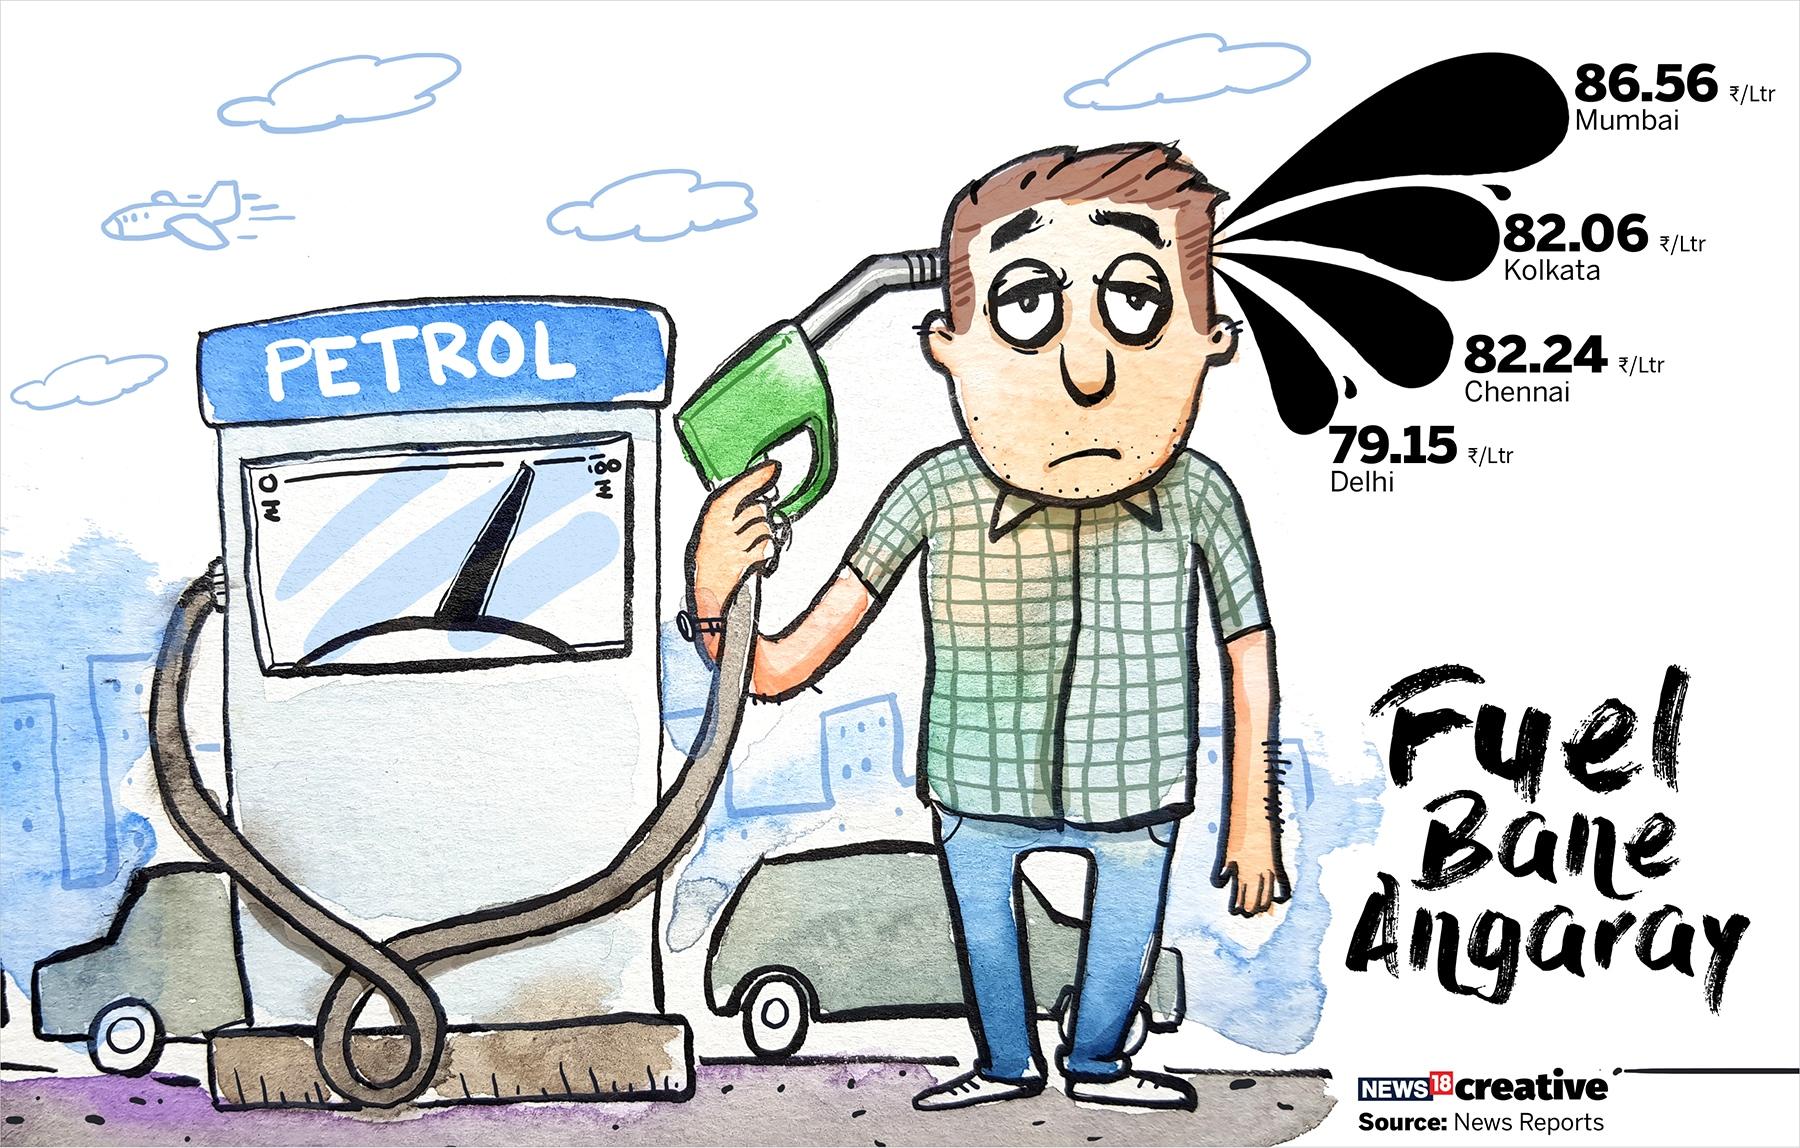 Petrol creative